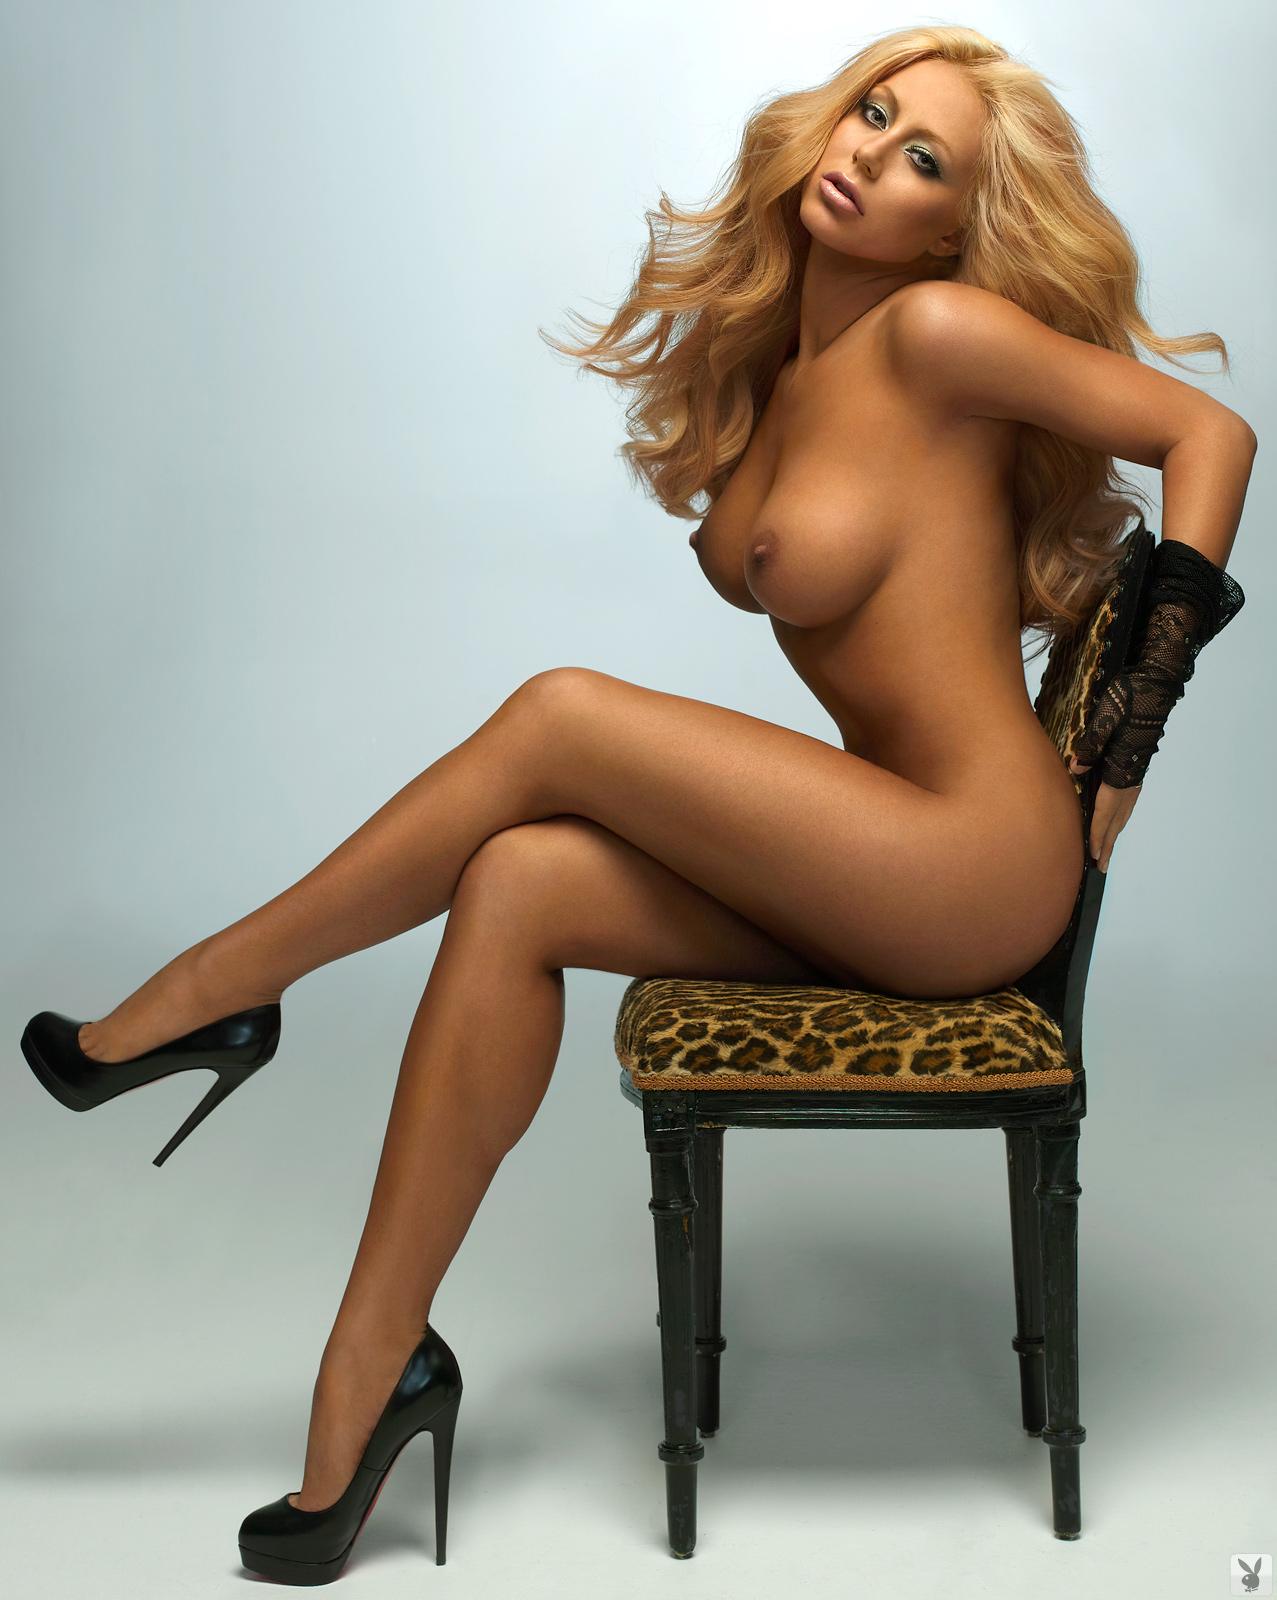 Aubrey o day naked playboy group